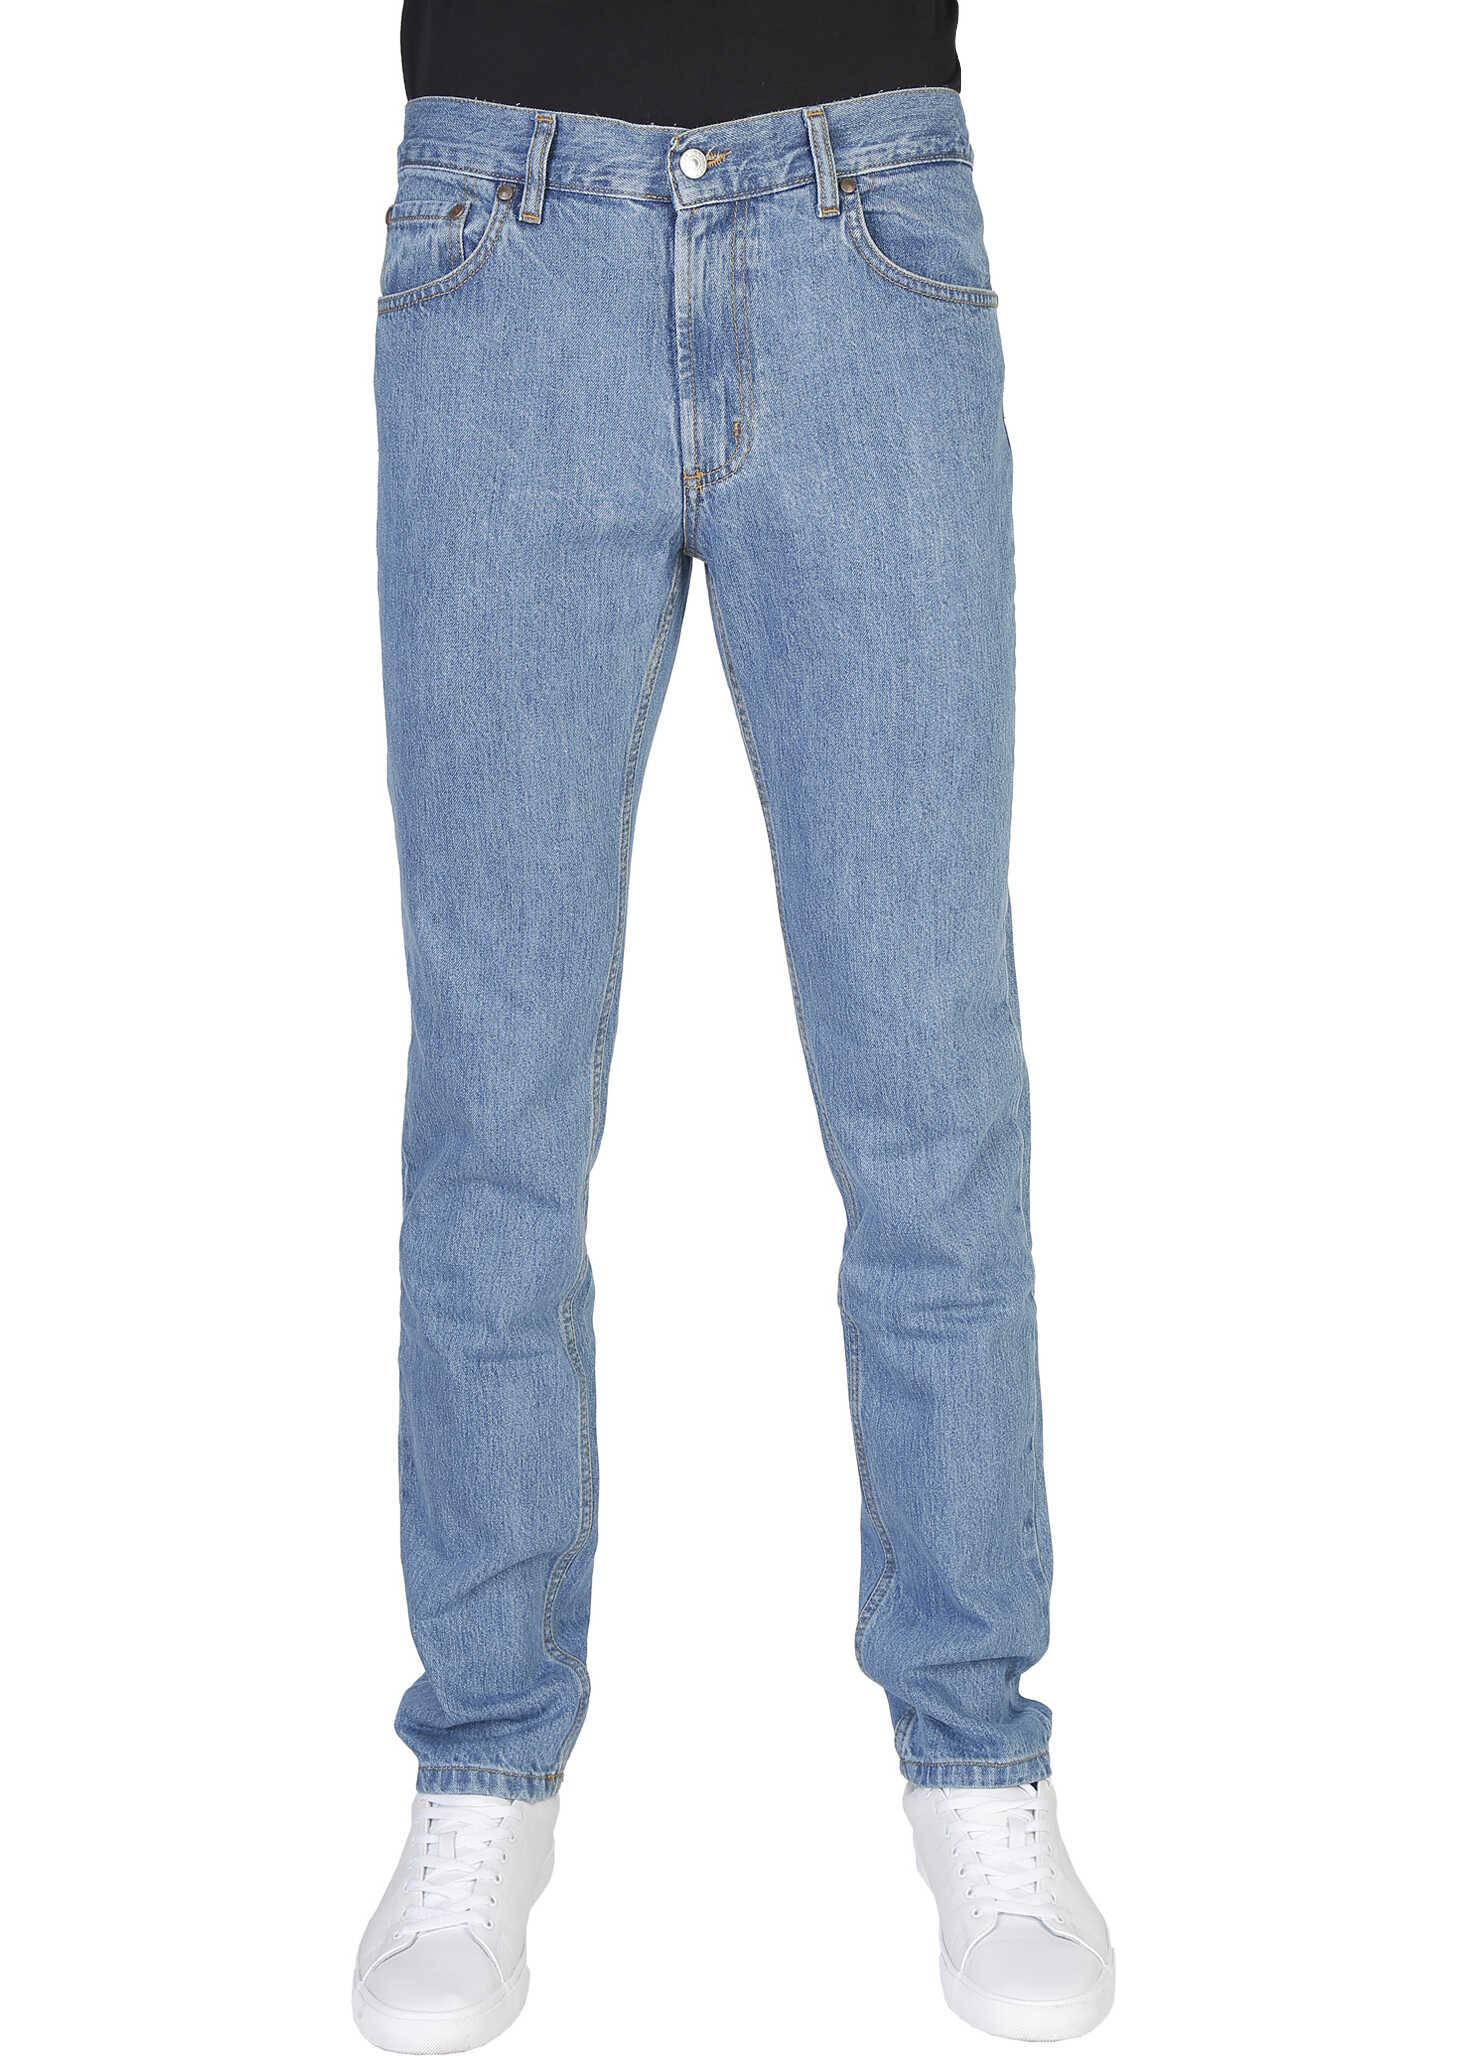 Carrera Jeans 000700_01021 Blue